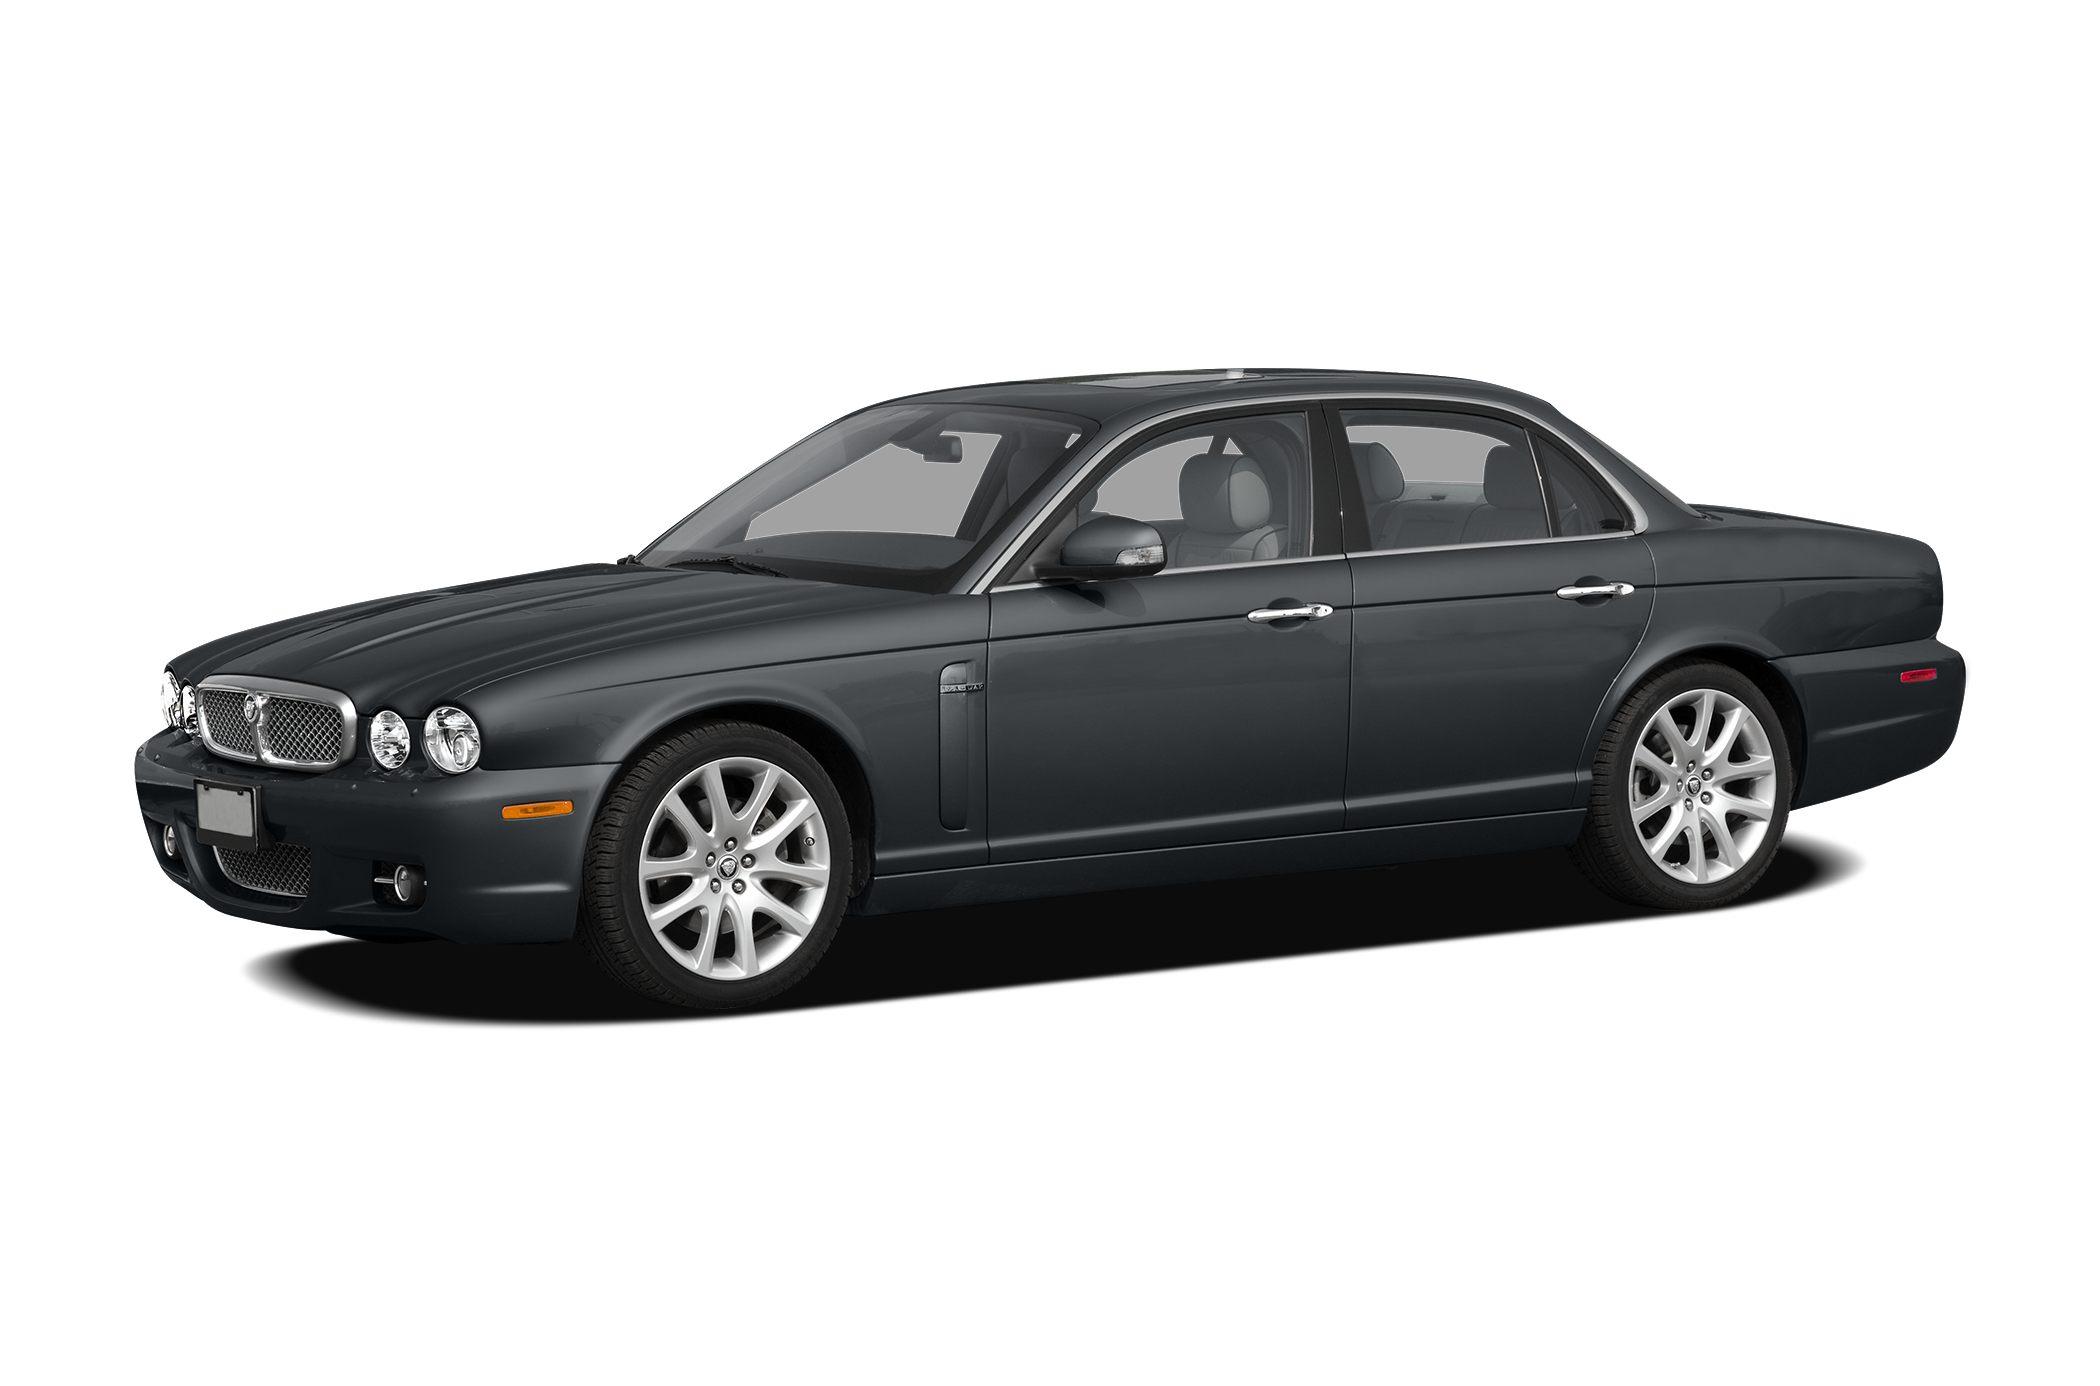 2008 Jaguar XJ8 L Sedan for sale in Douglasville for $19,985 with 77,187 miles